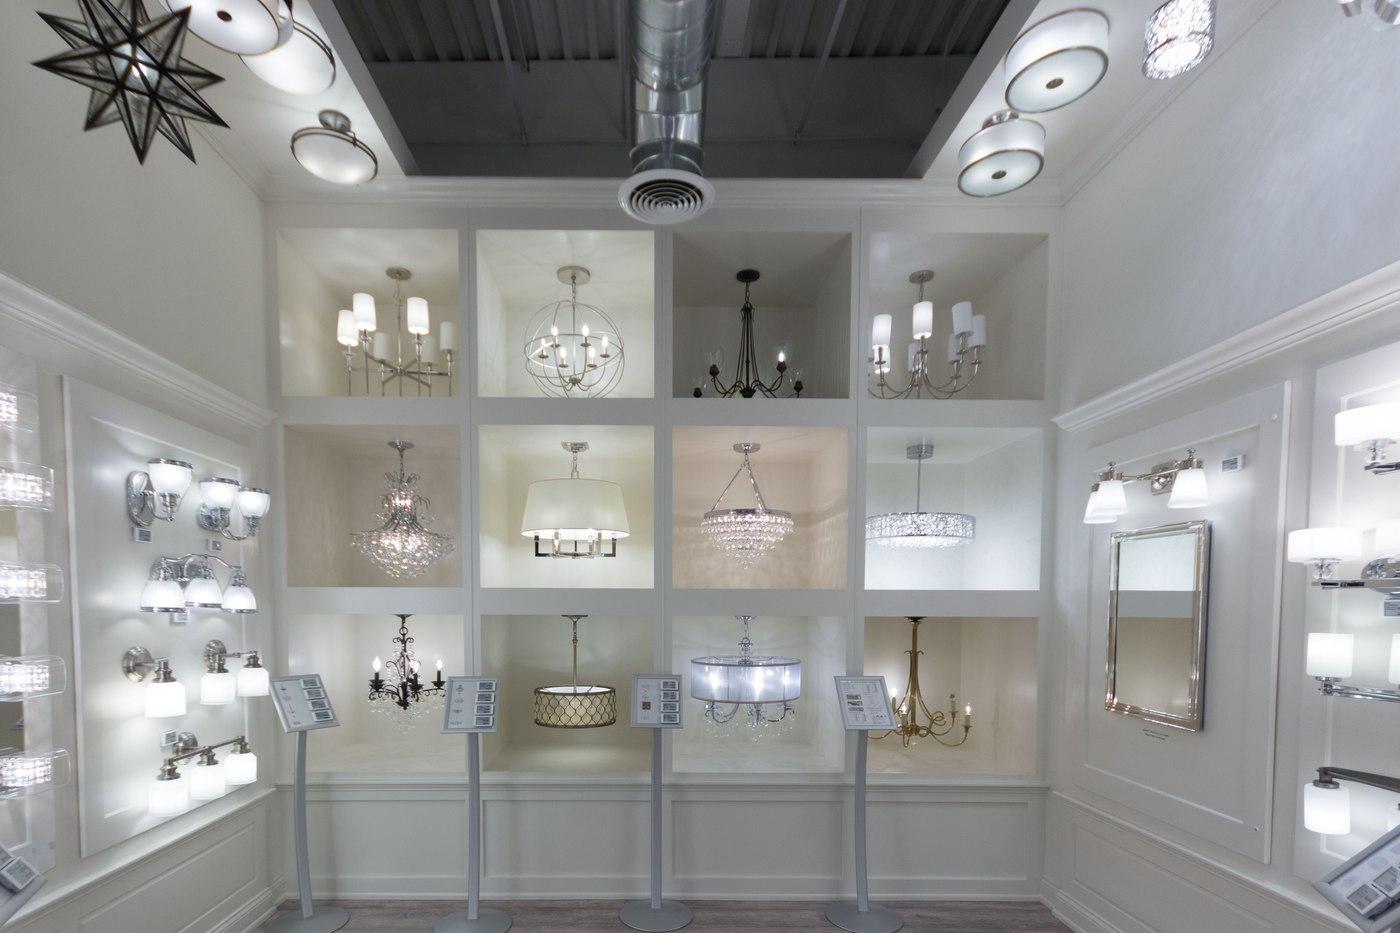 Yale Bathroom Lighting all kitchen, bath, and living room lighting is 12.5% off